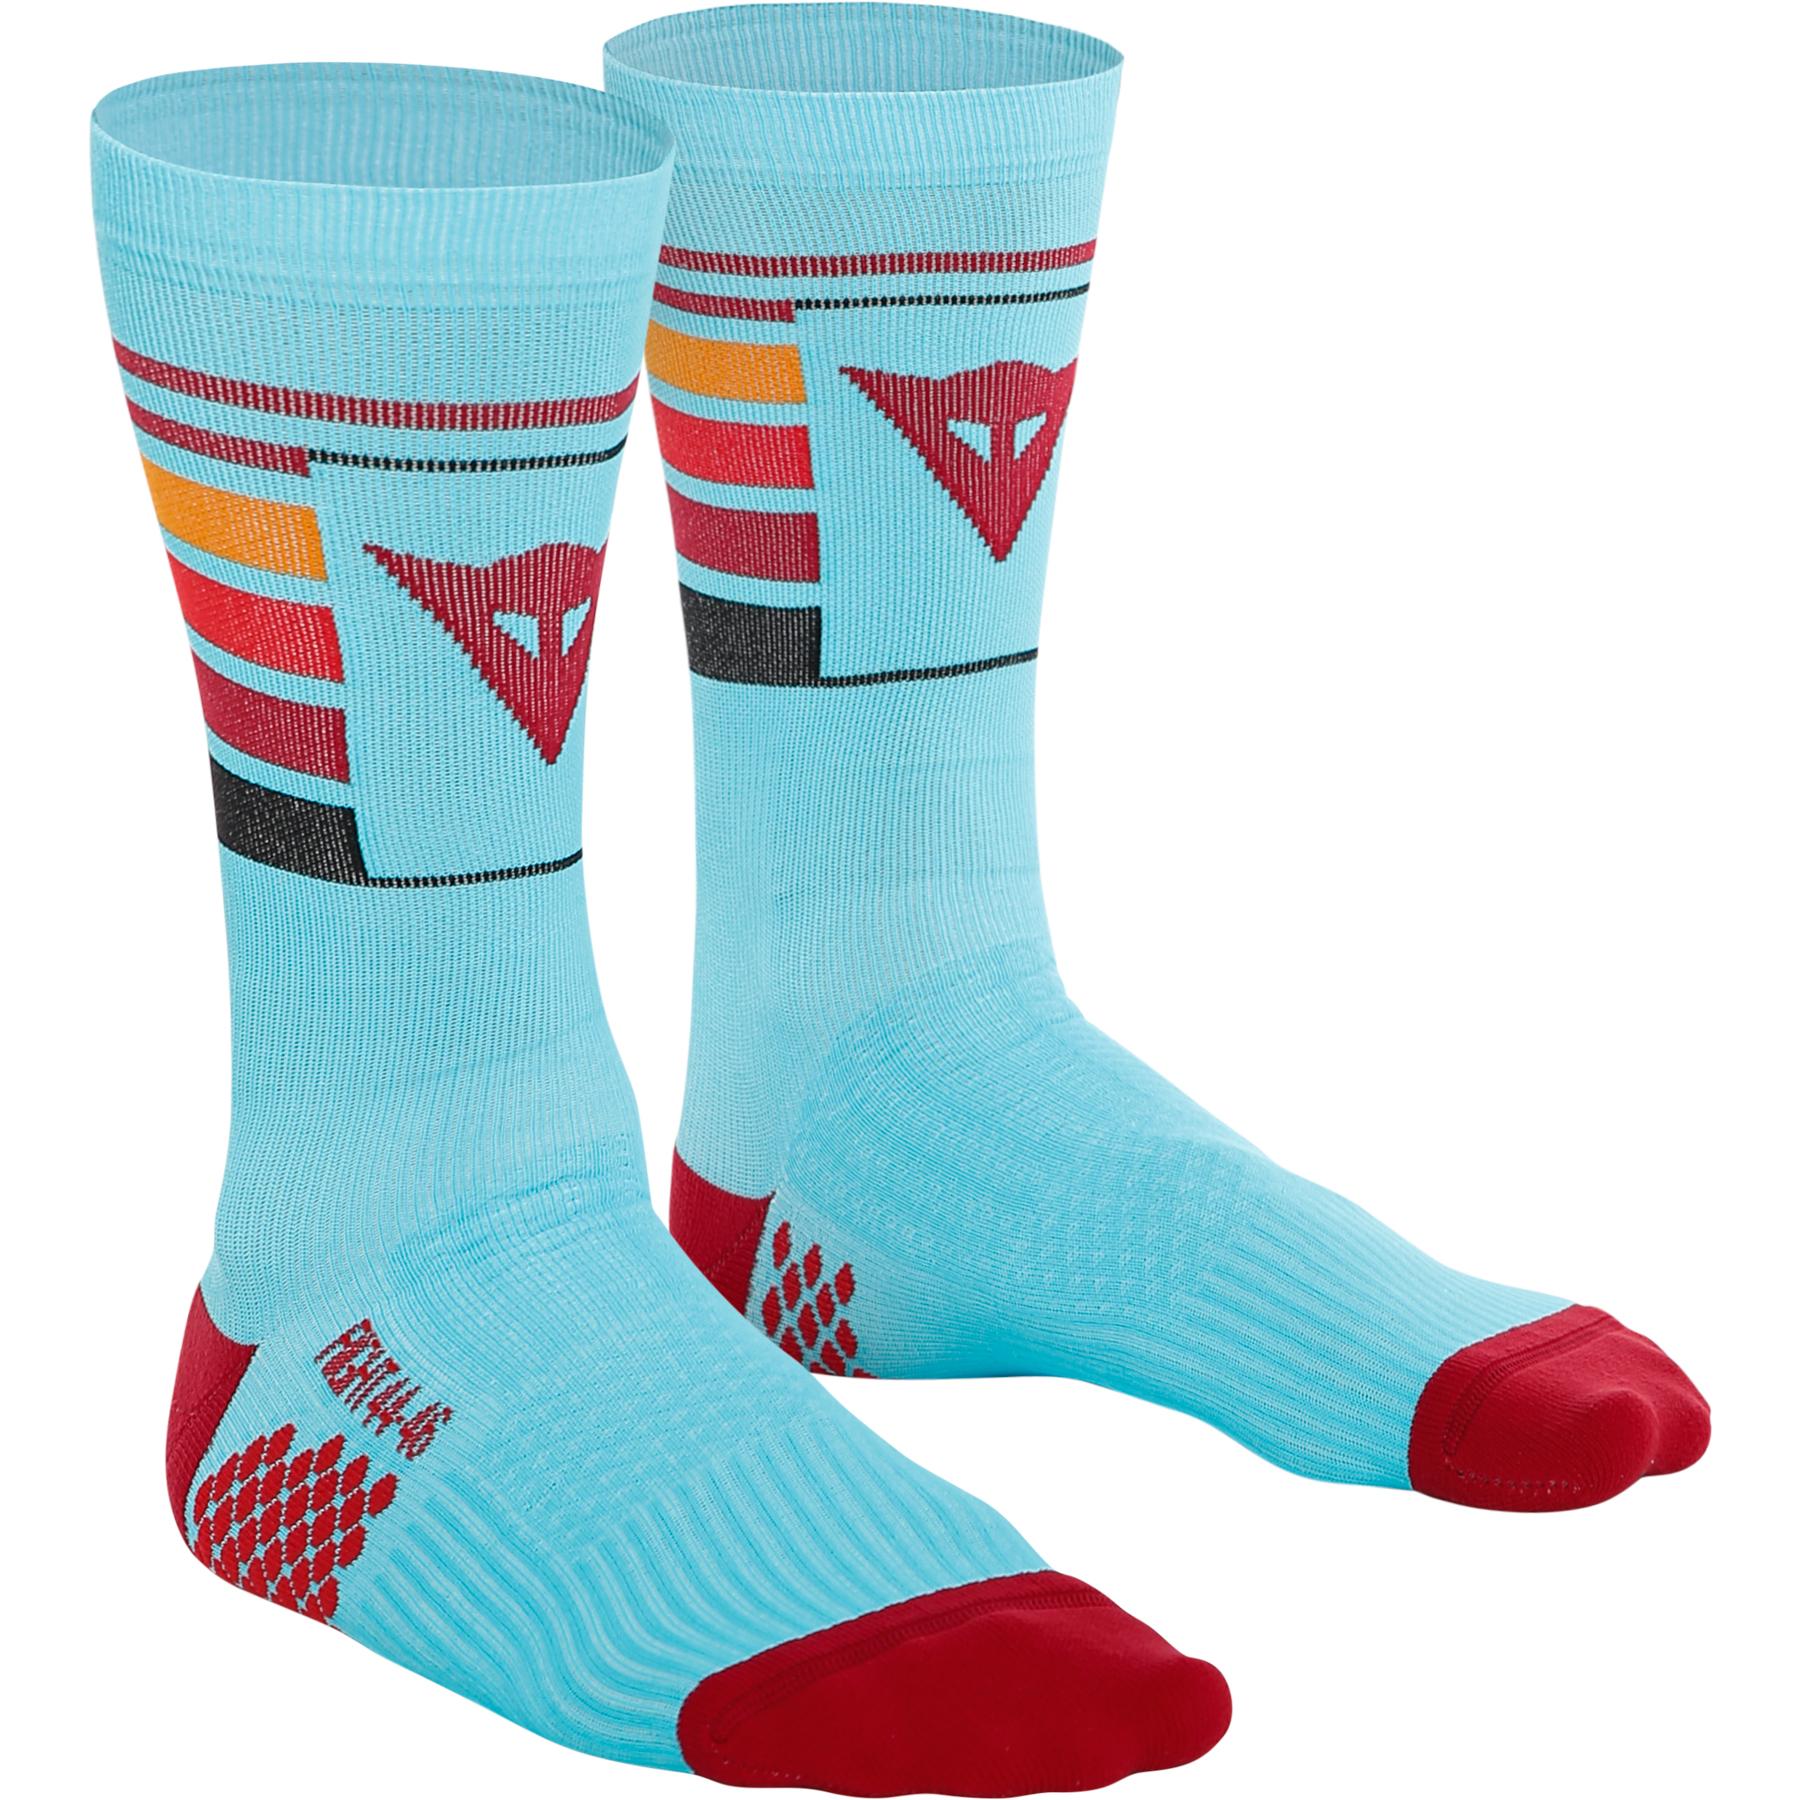 Dainese HG Hallerbos Socks Mid - light blue/red